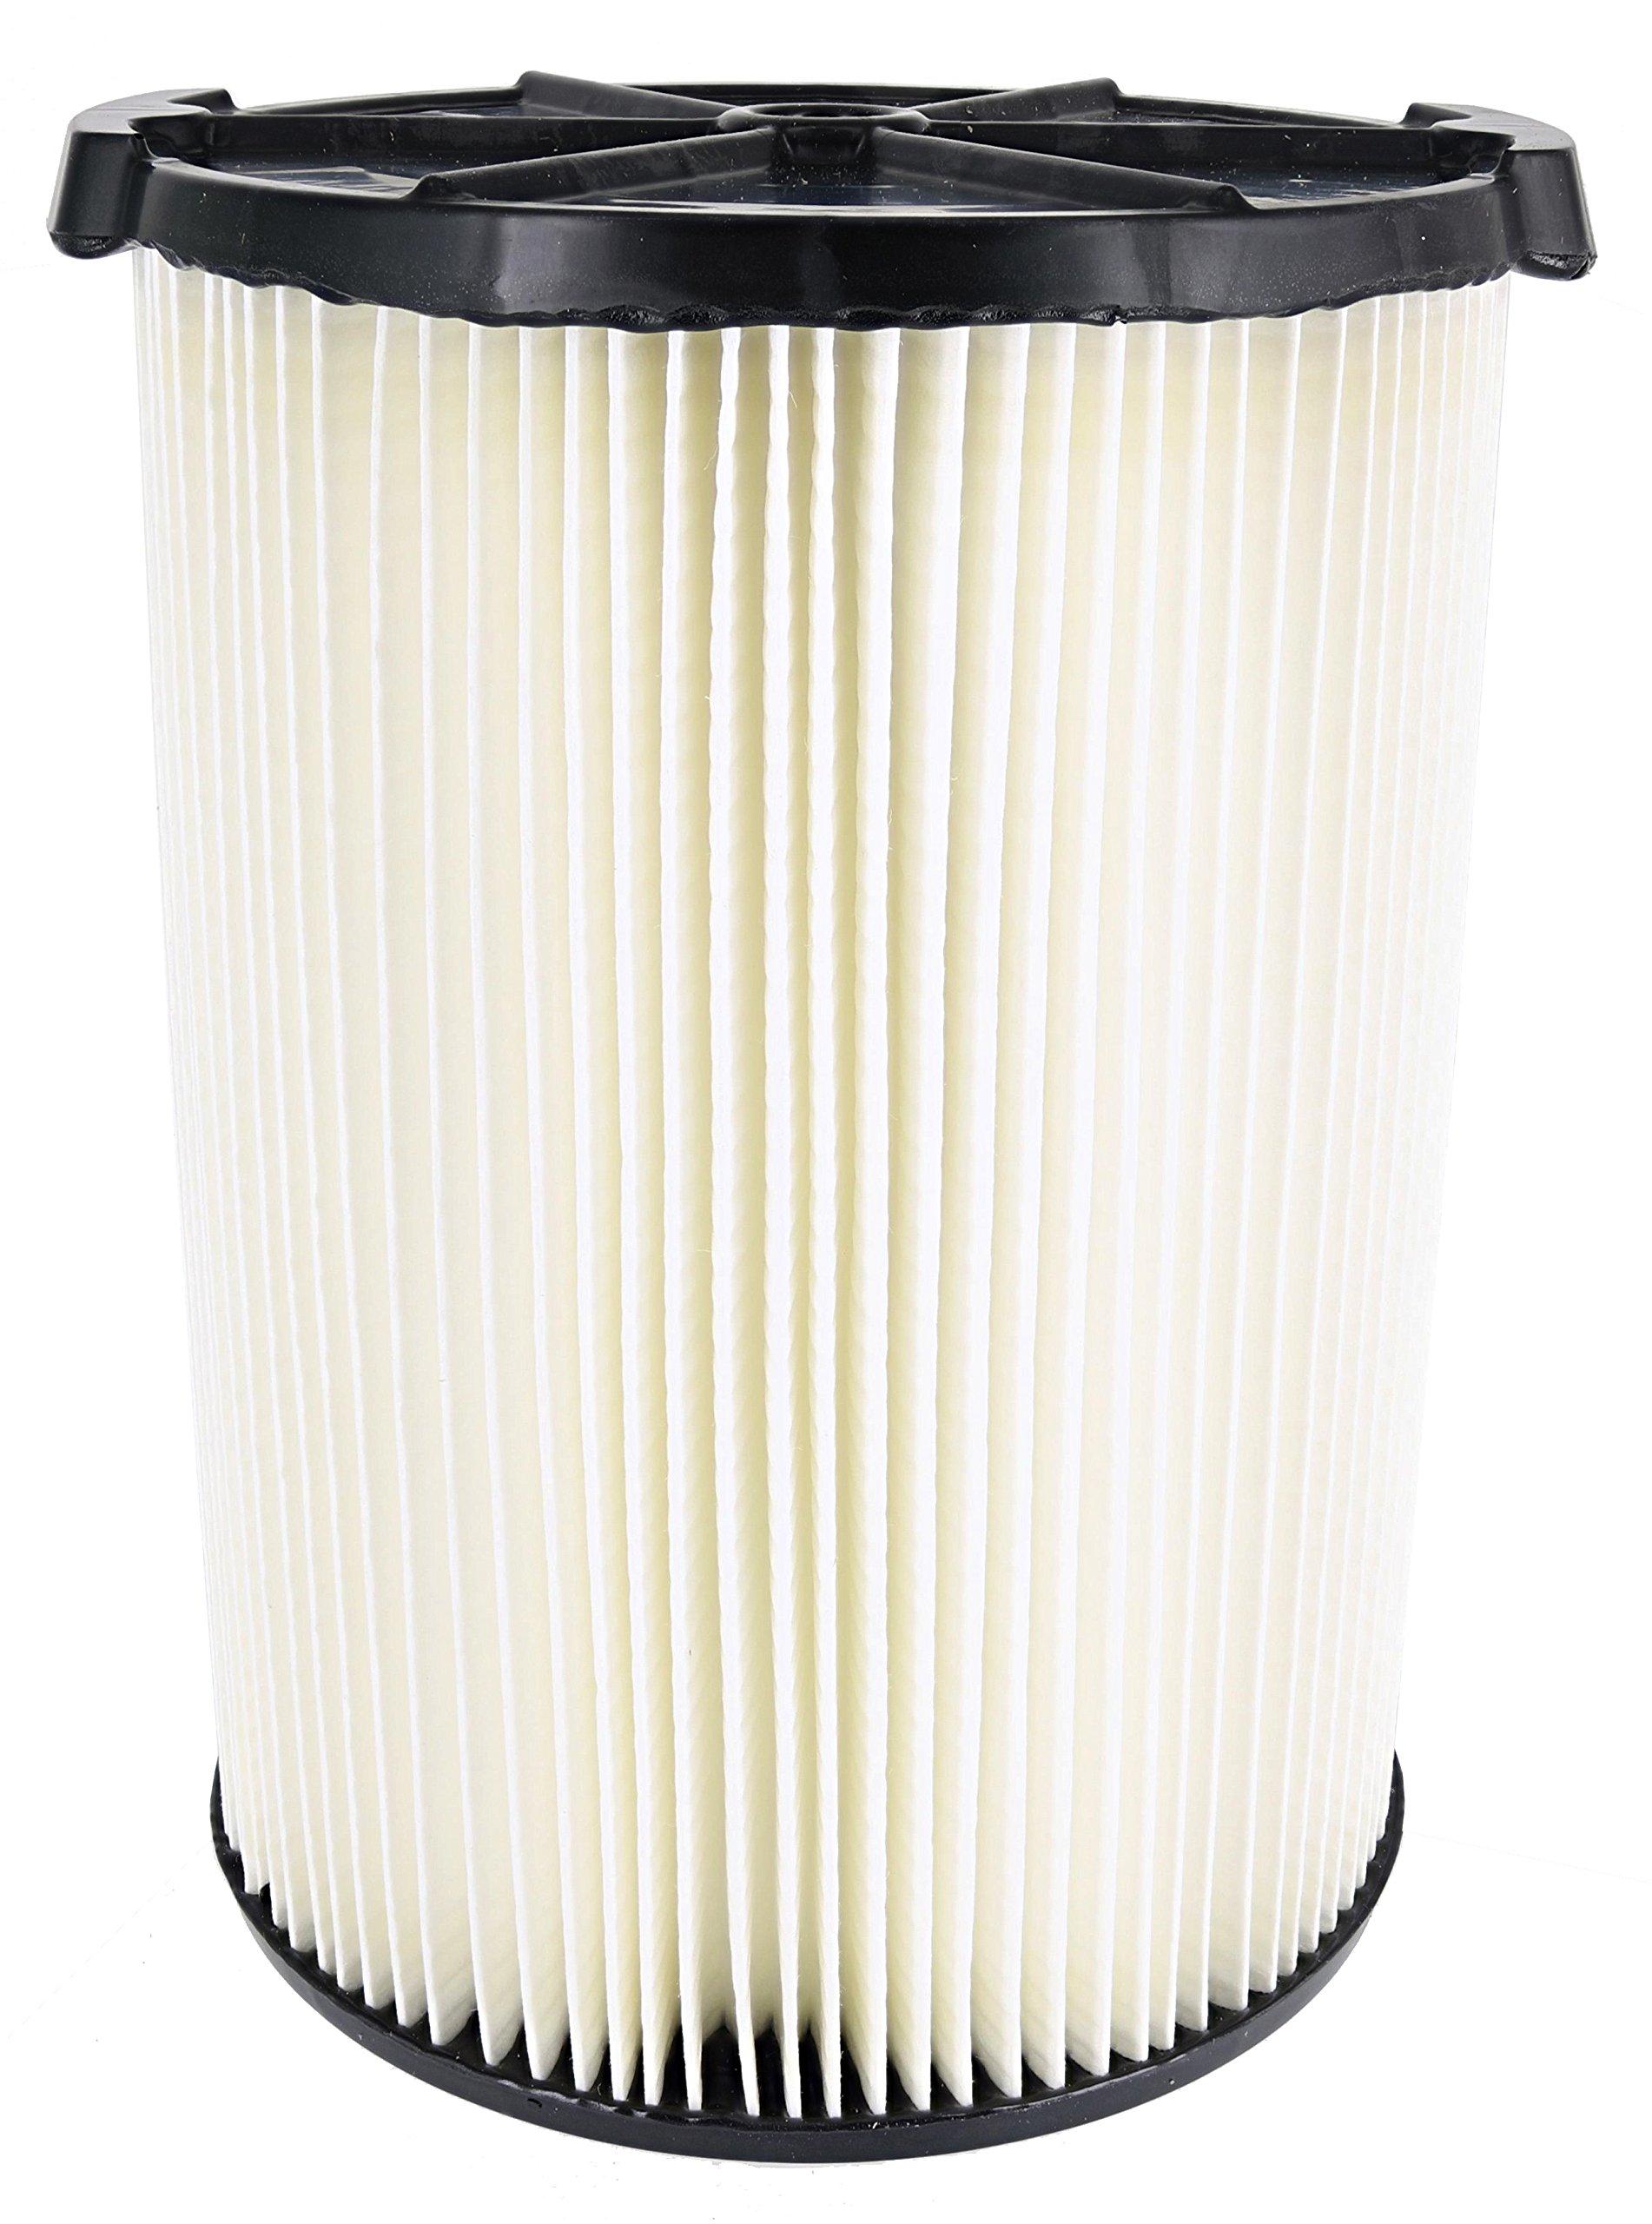 Ridgid Standard Wet/dry Vac Filter Vf4000 (White, 1)